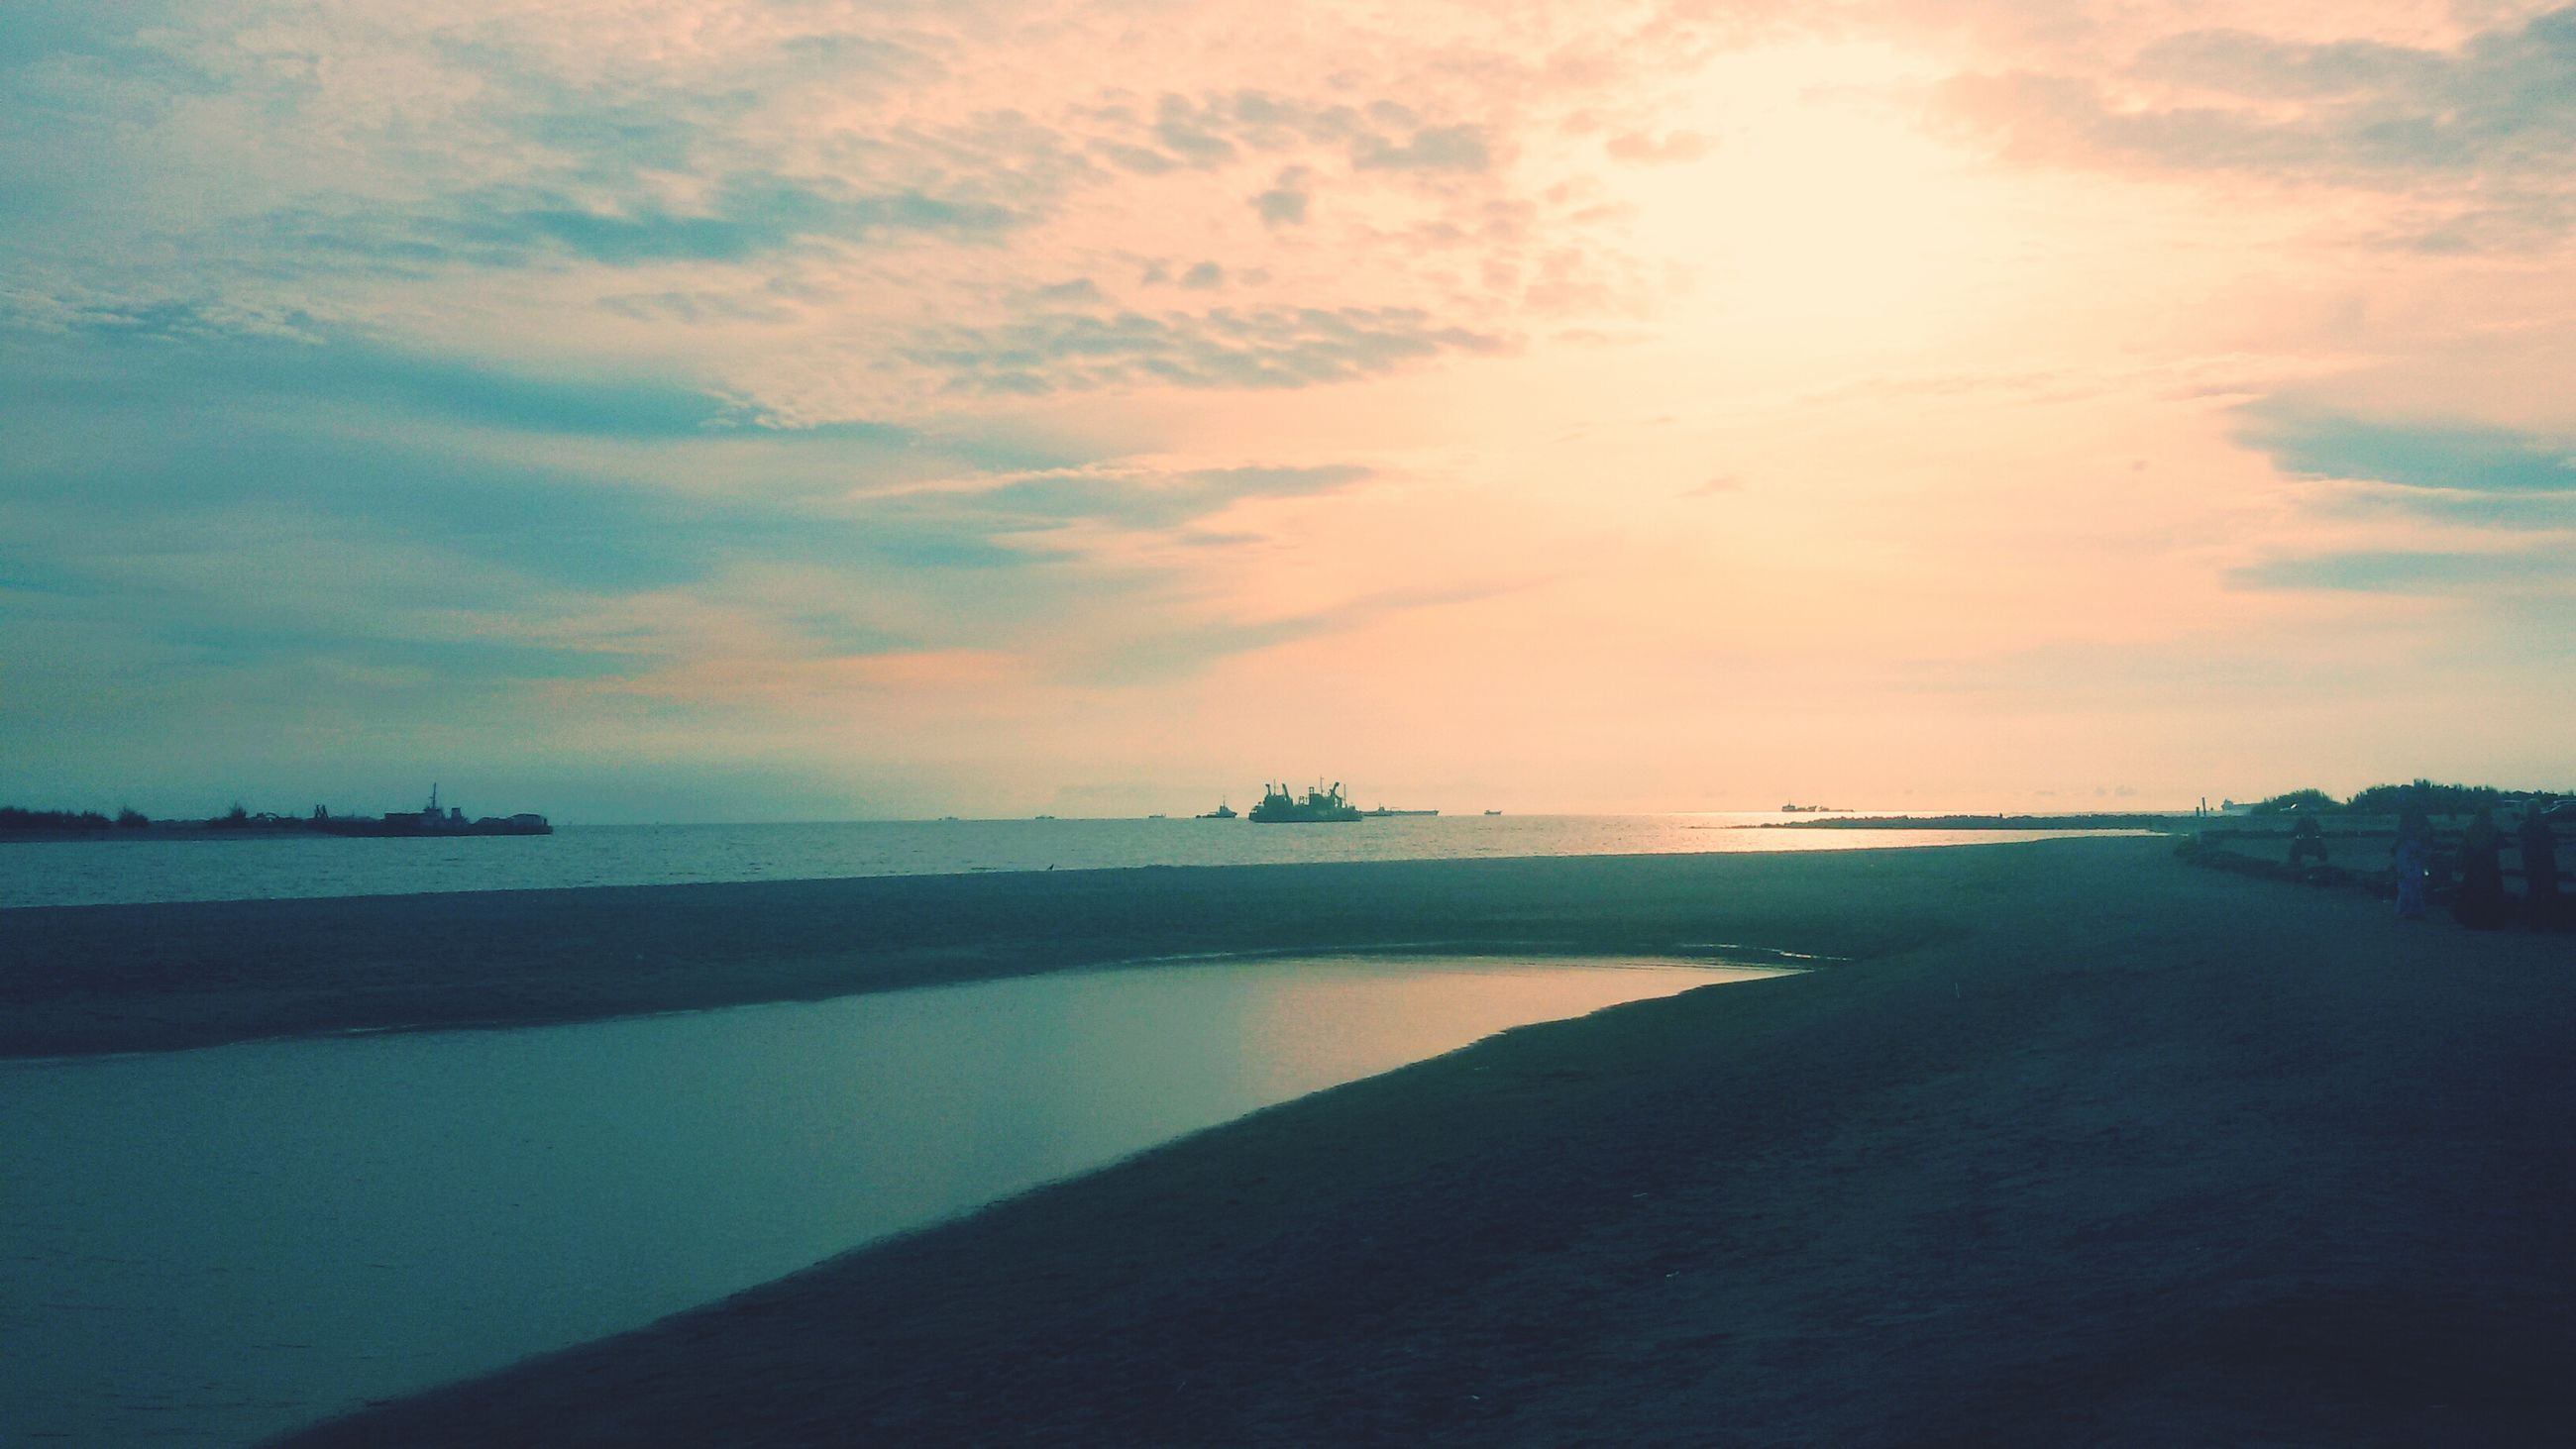 water, sea, sky, beach, tranquil scene, scenics, tranquility, beauty in nature, sunset, shore, horizon over water, cloud - sky, nature, reflection, idyllic, sand, sun, coastline, sunlight, cloud